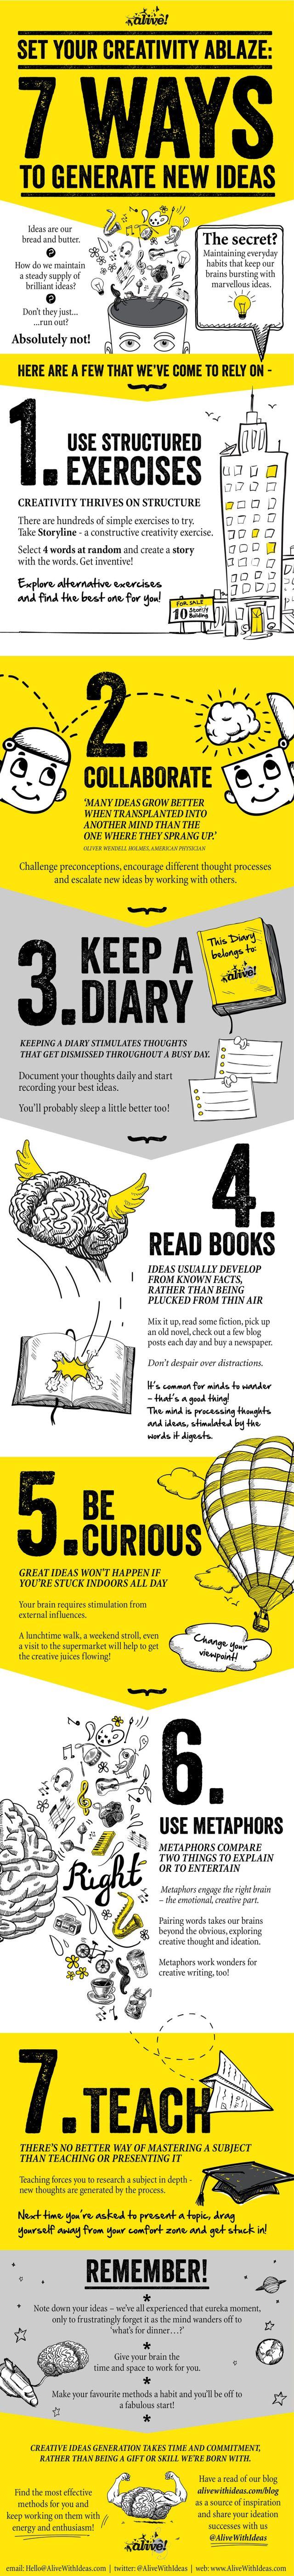 Set Your Creativity Ablaze: 7 Ways to Generate New Ideas #infographic